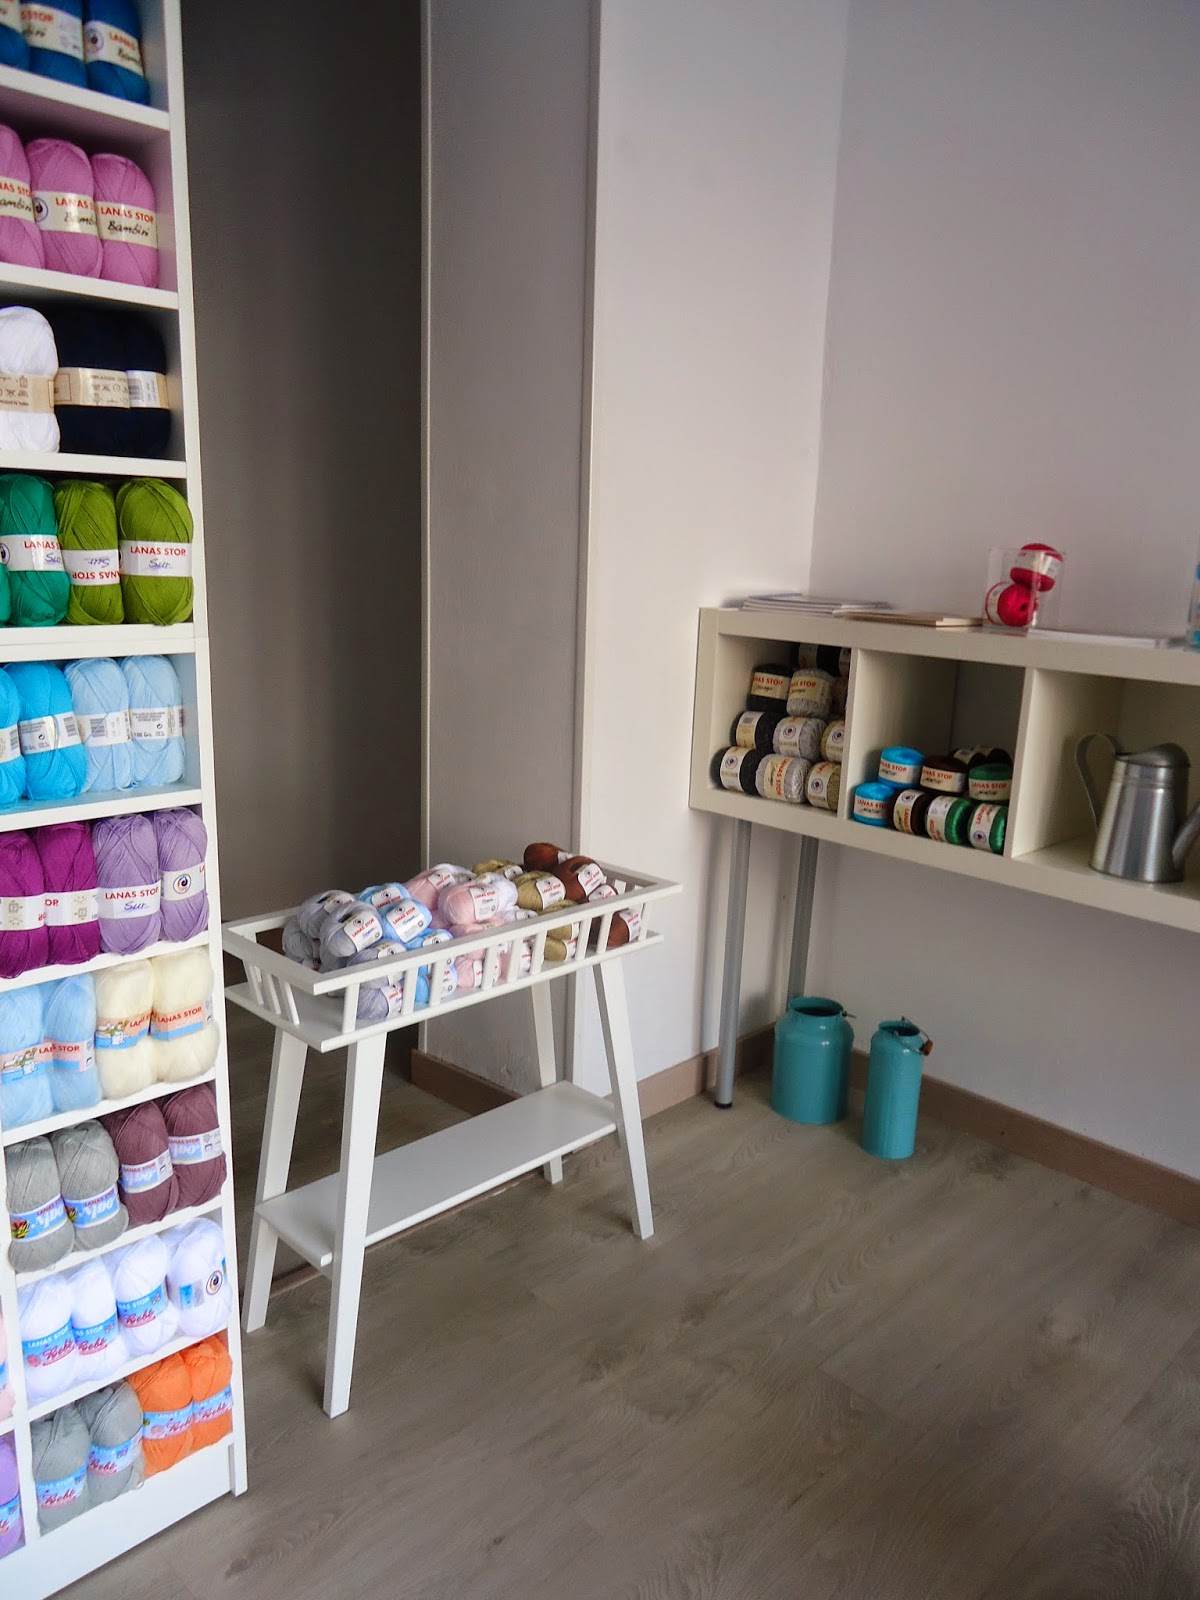 L de Lana, lana, labores,Knitting, Tejer